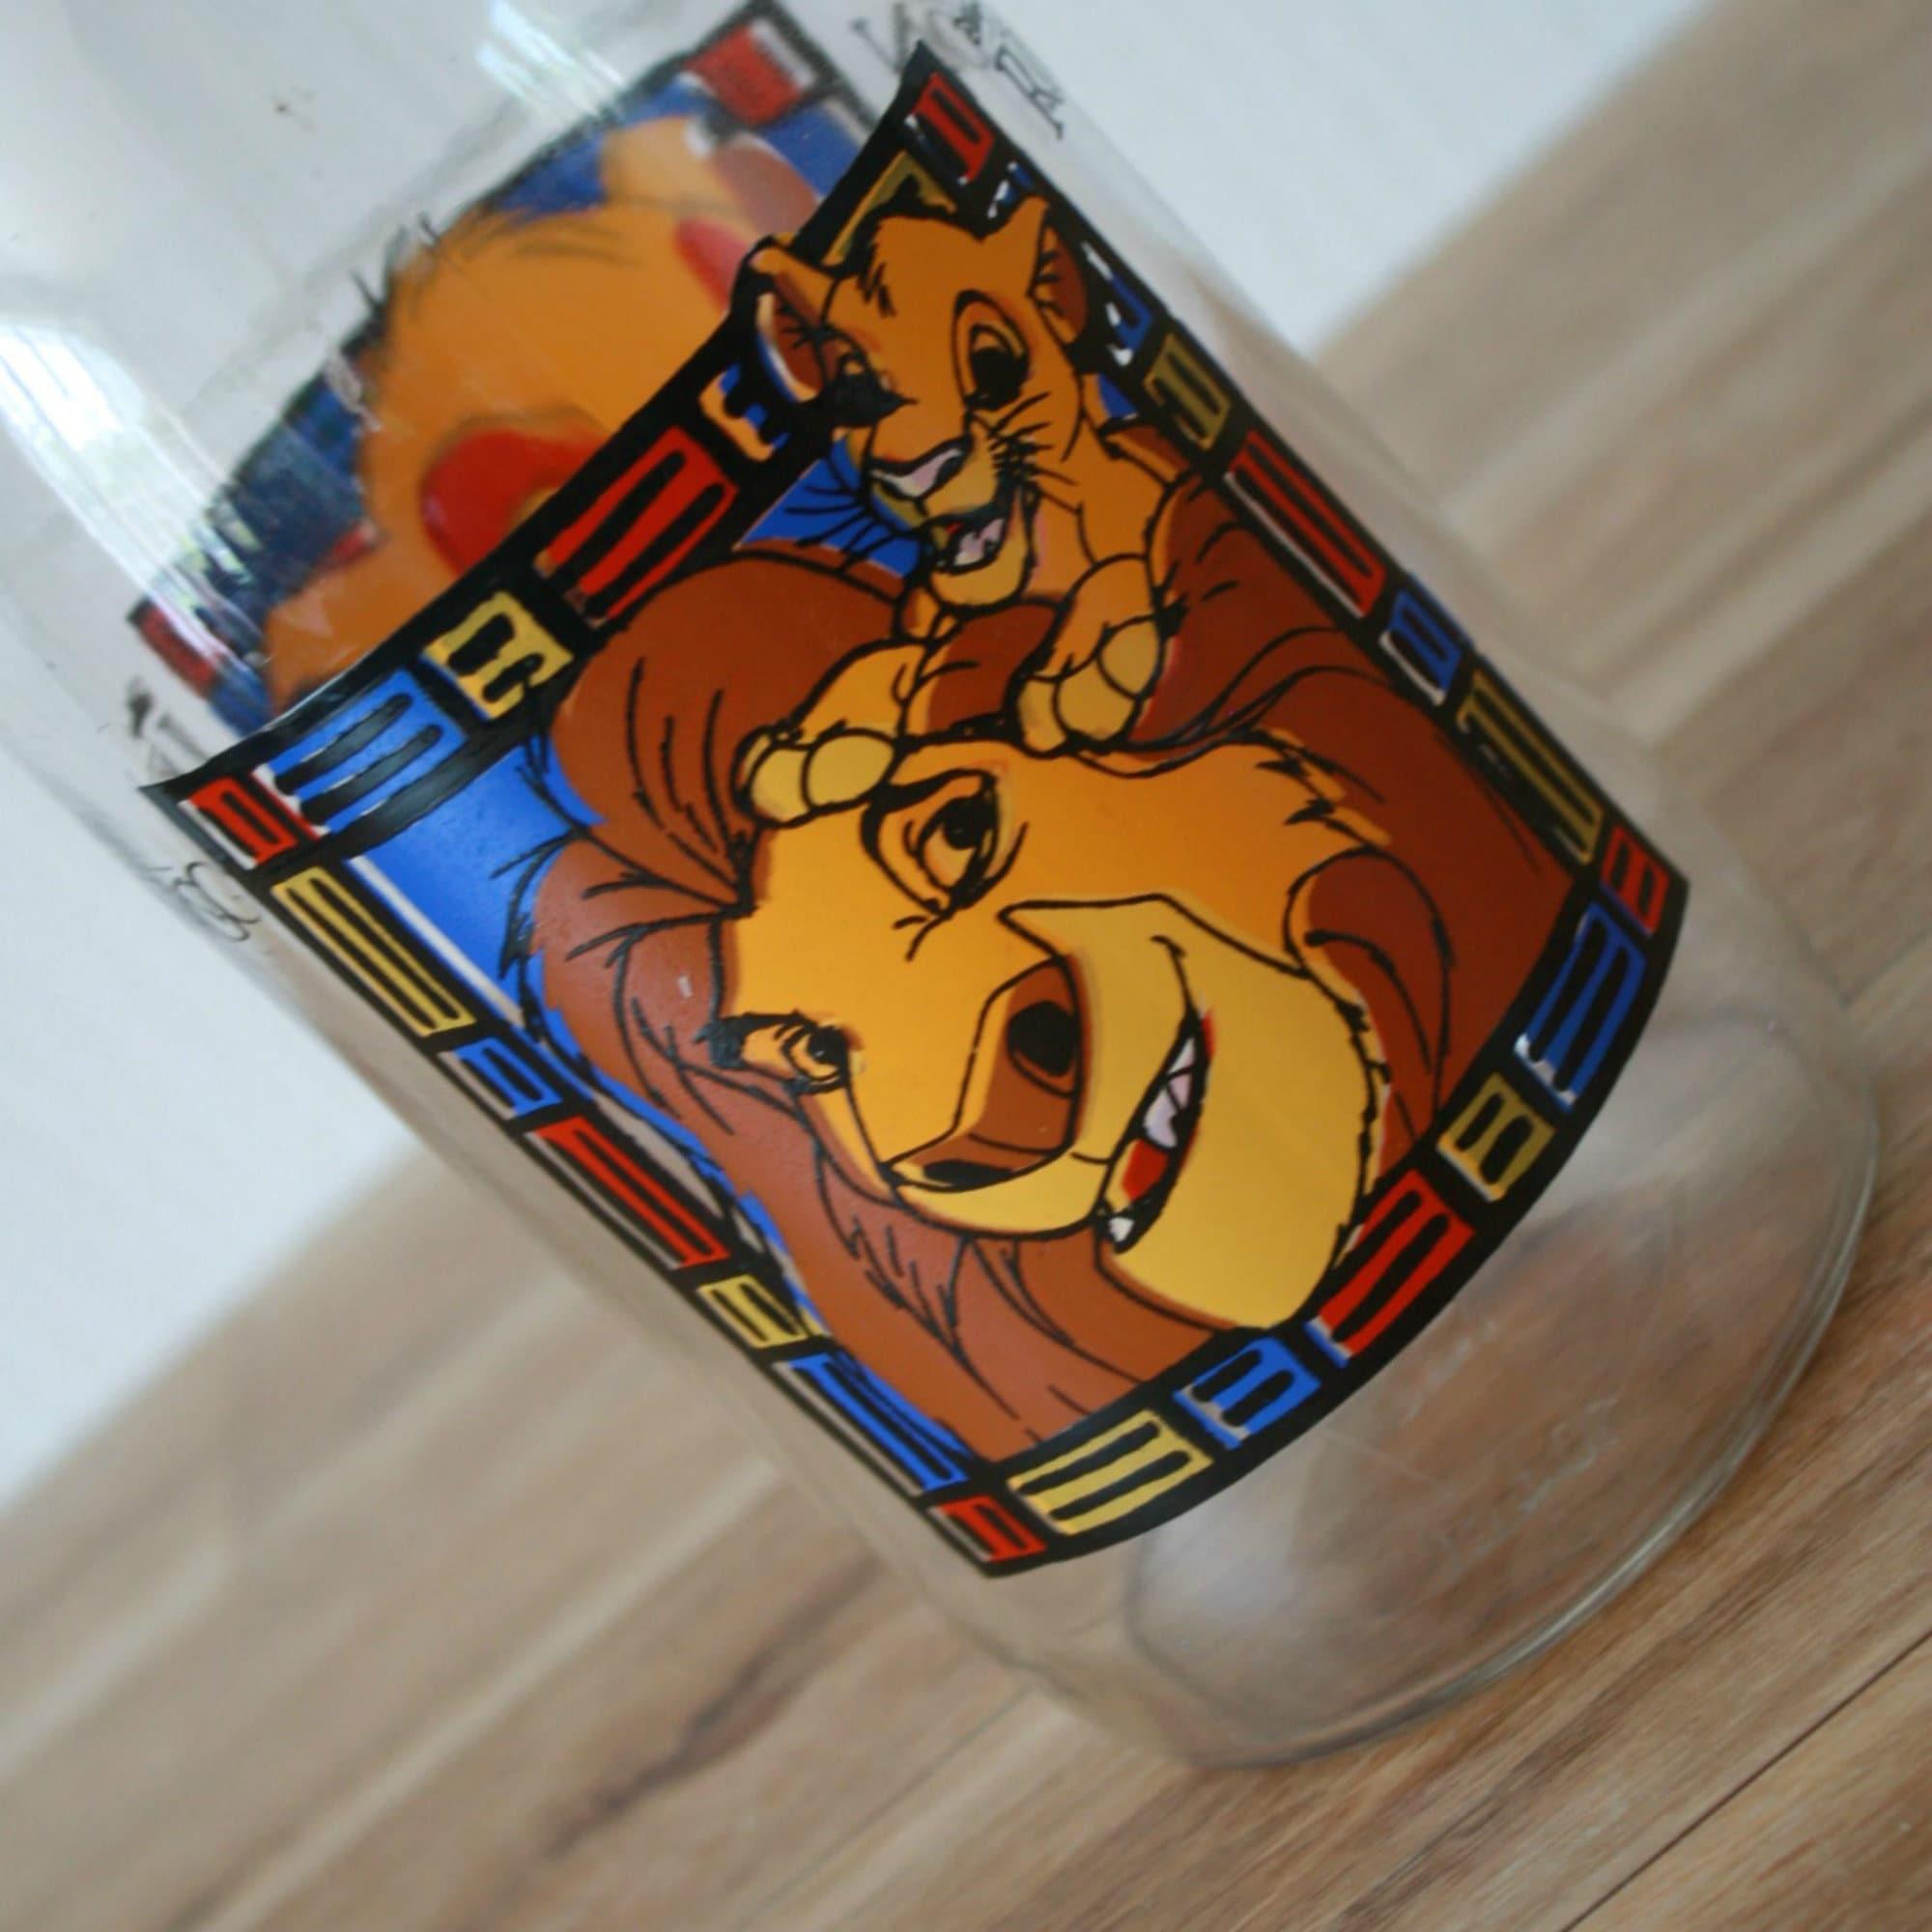 Topf König Löwe 1990 Topf Saft Disney Topf Simba Mufasa | Etsy